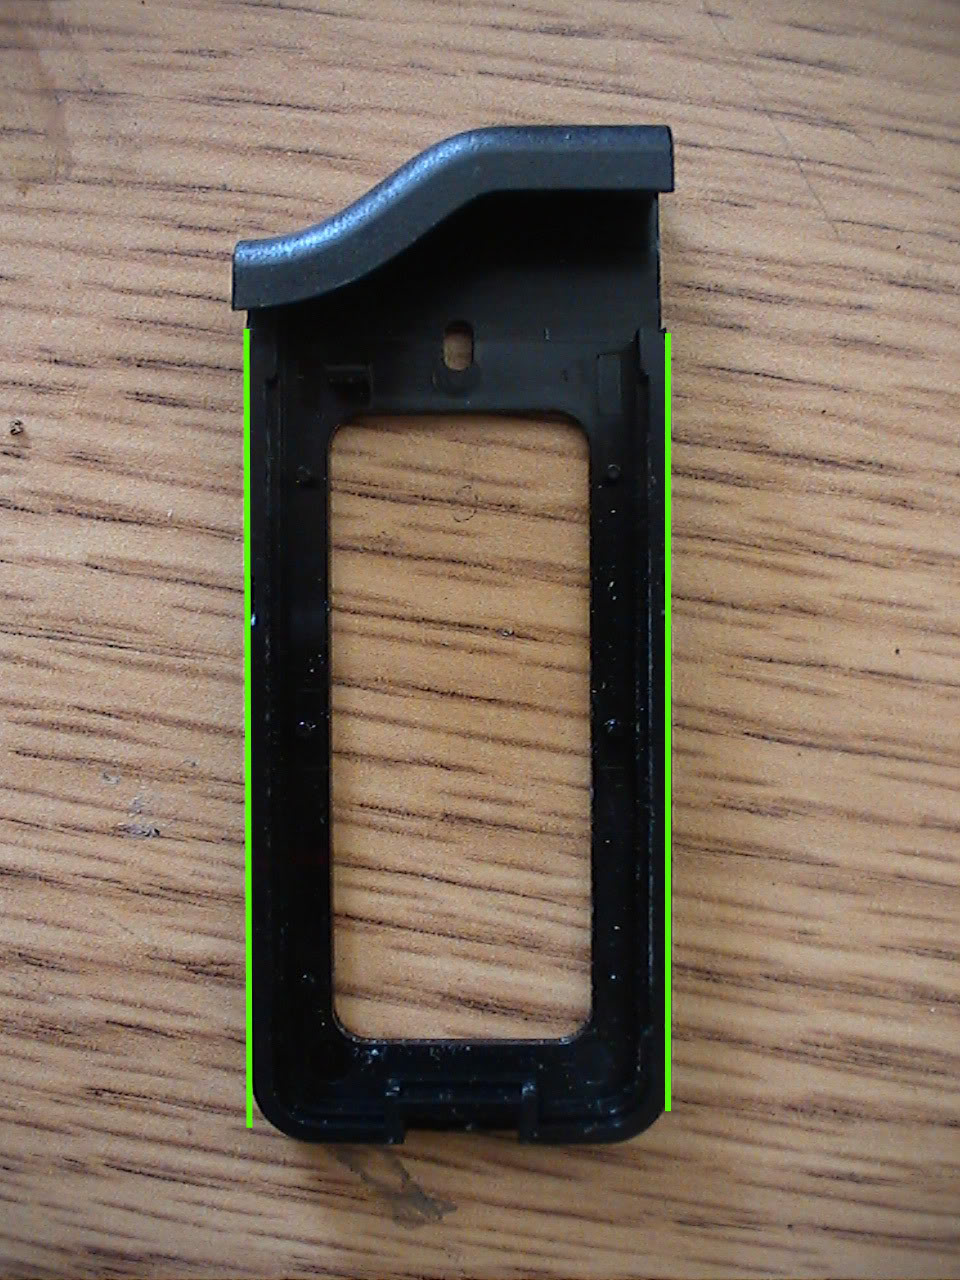 a95d95bcec0b98d1ad349c5832049707  flip key fob python alarm